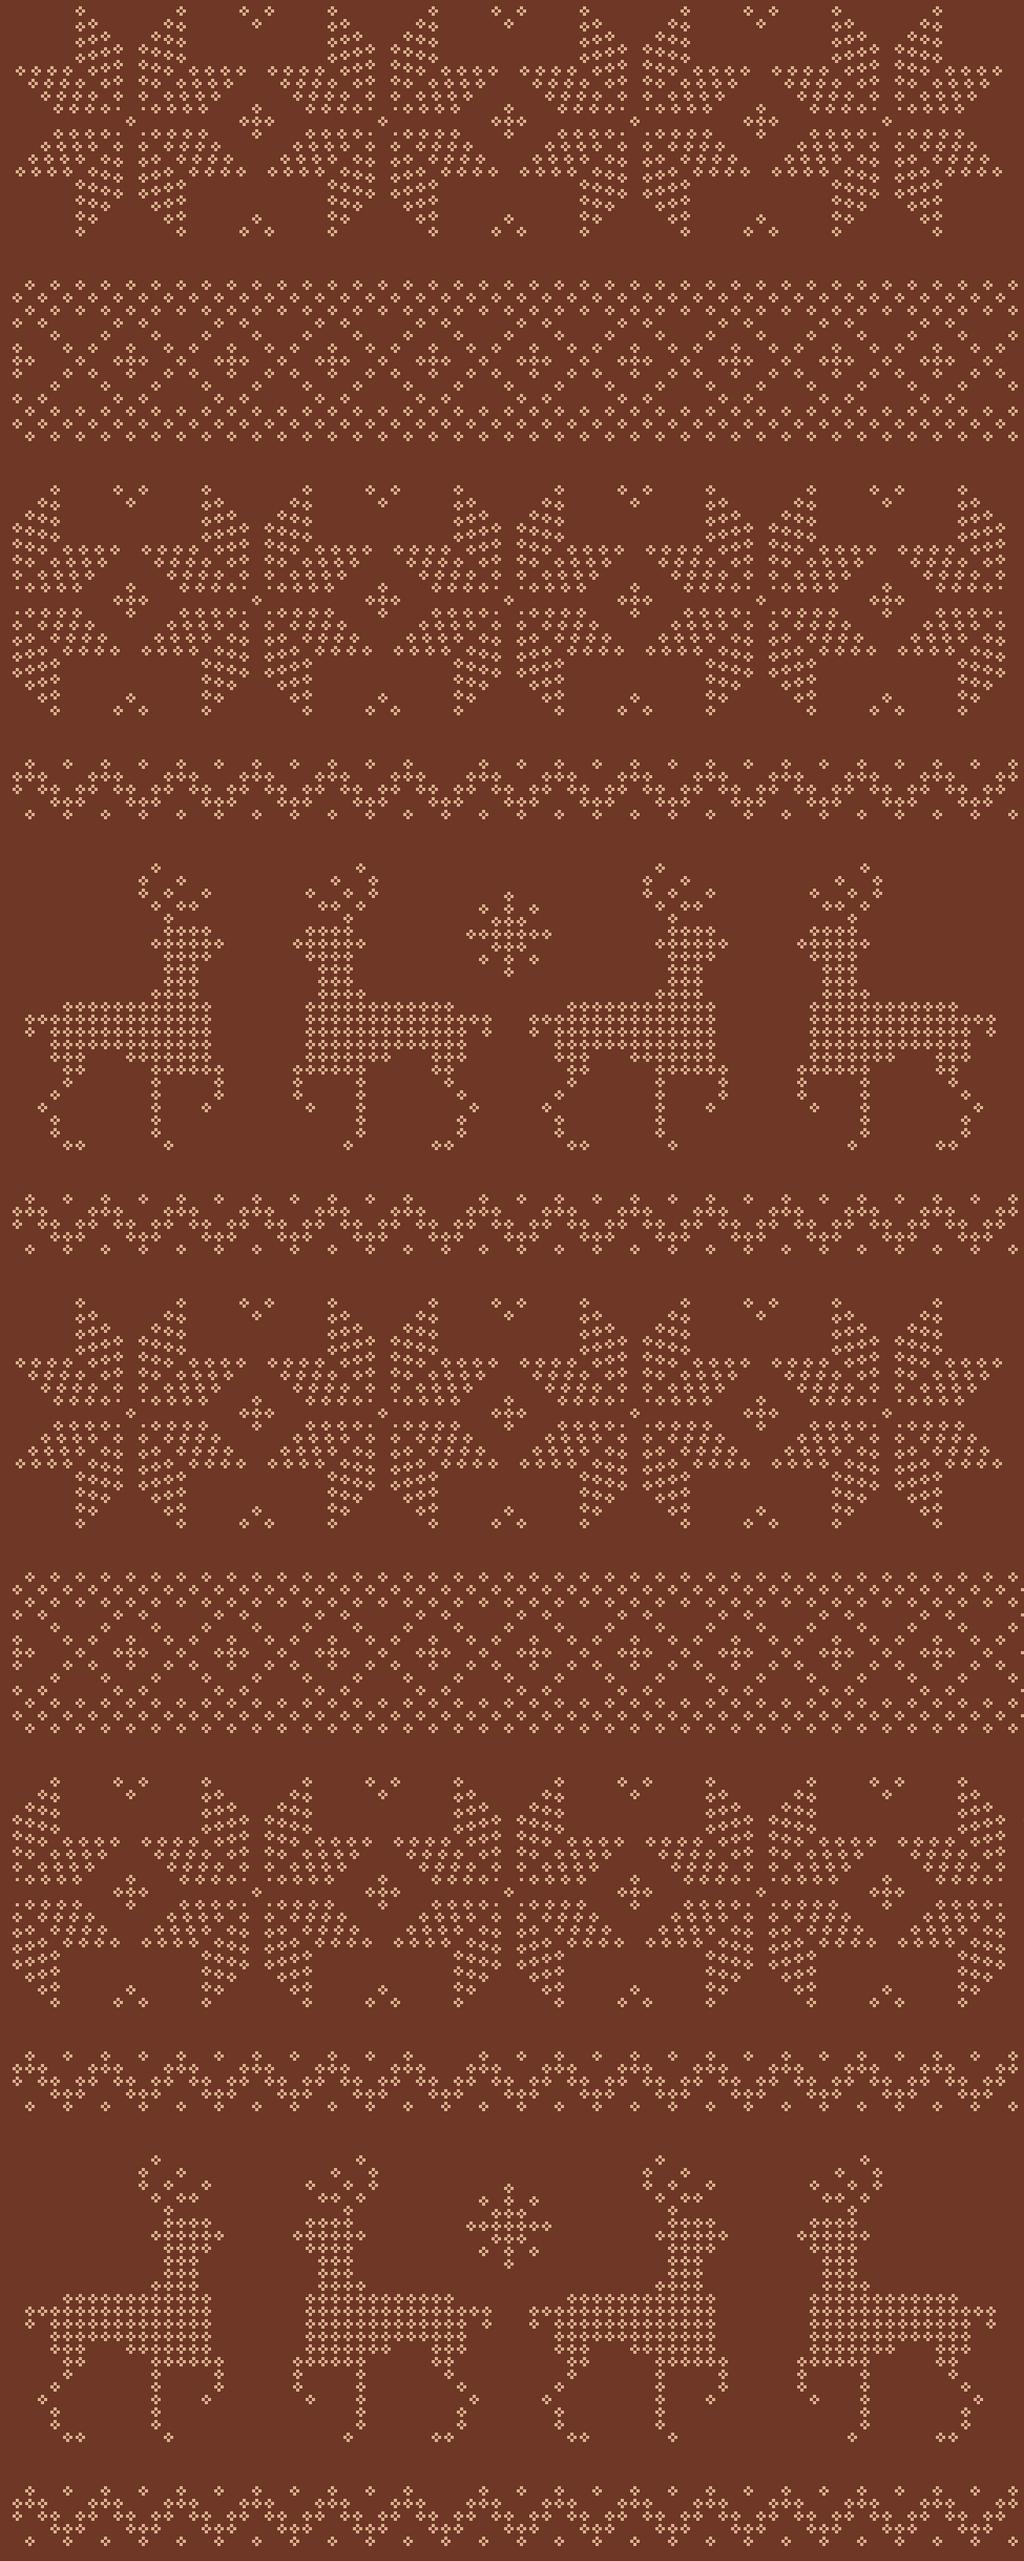 custom box background norwegian 001 by DesmodiaDesigns